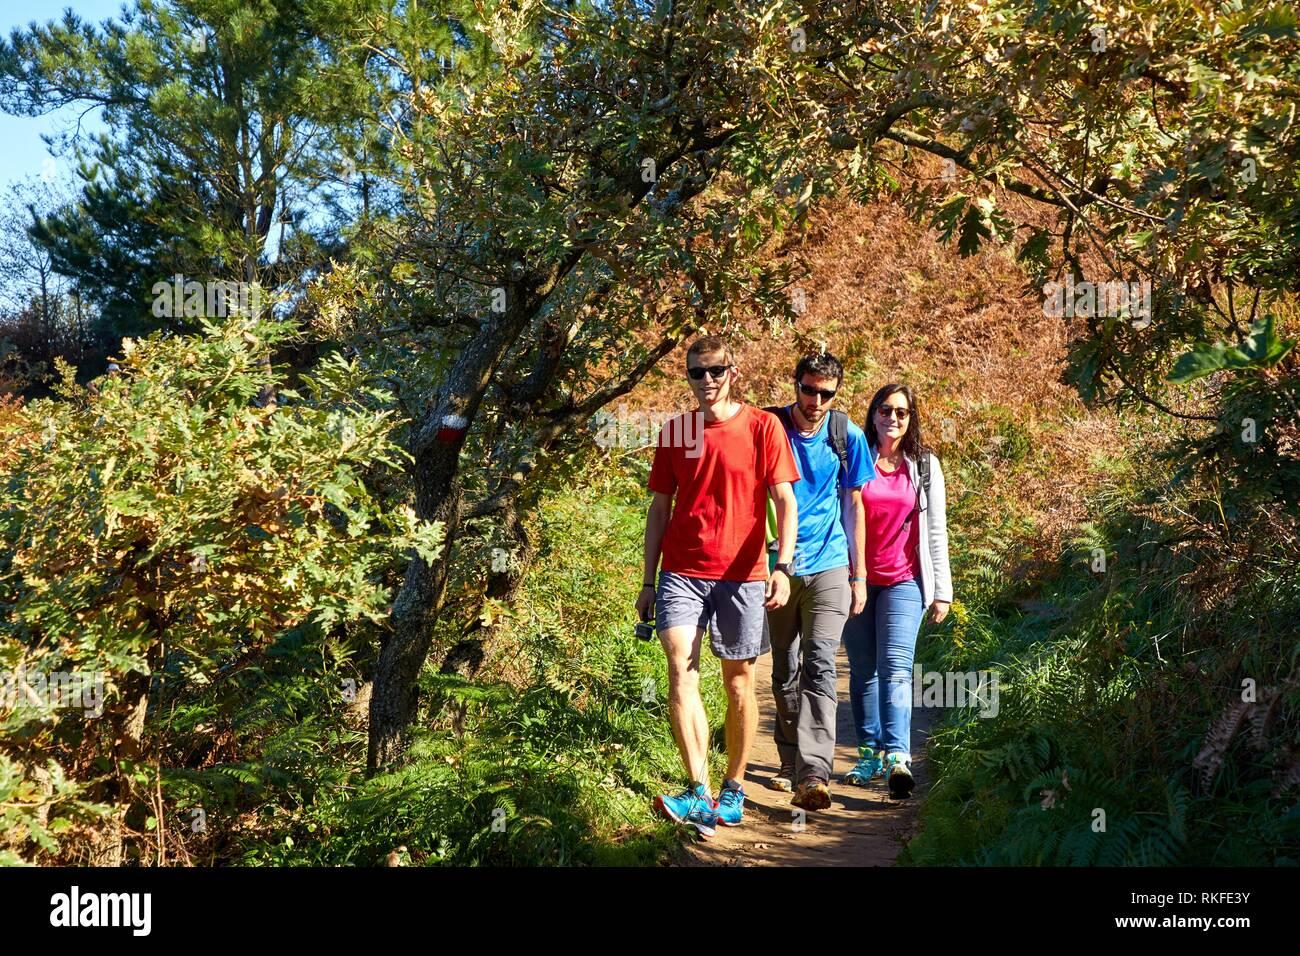 Group of tourists and guide making a tour of the Camino de Santiago, St. james Way, Pasaia, Donostia, San Sebastian, Gipuzkoa, Basque Country, Spain, - Stock Image